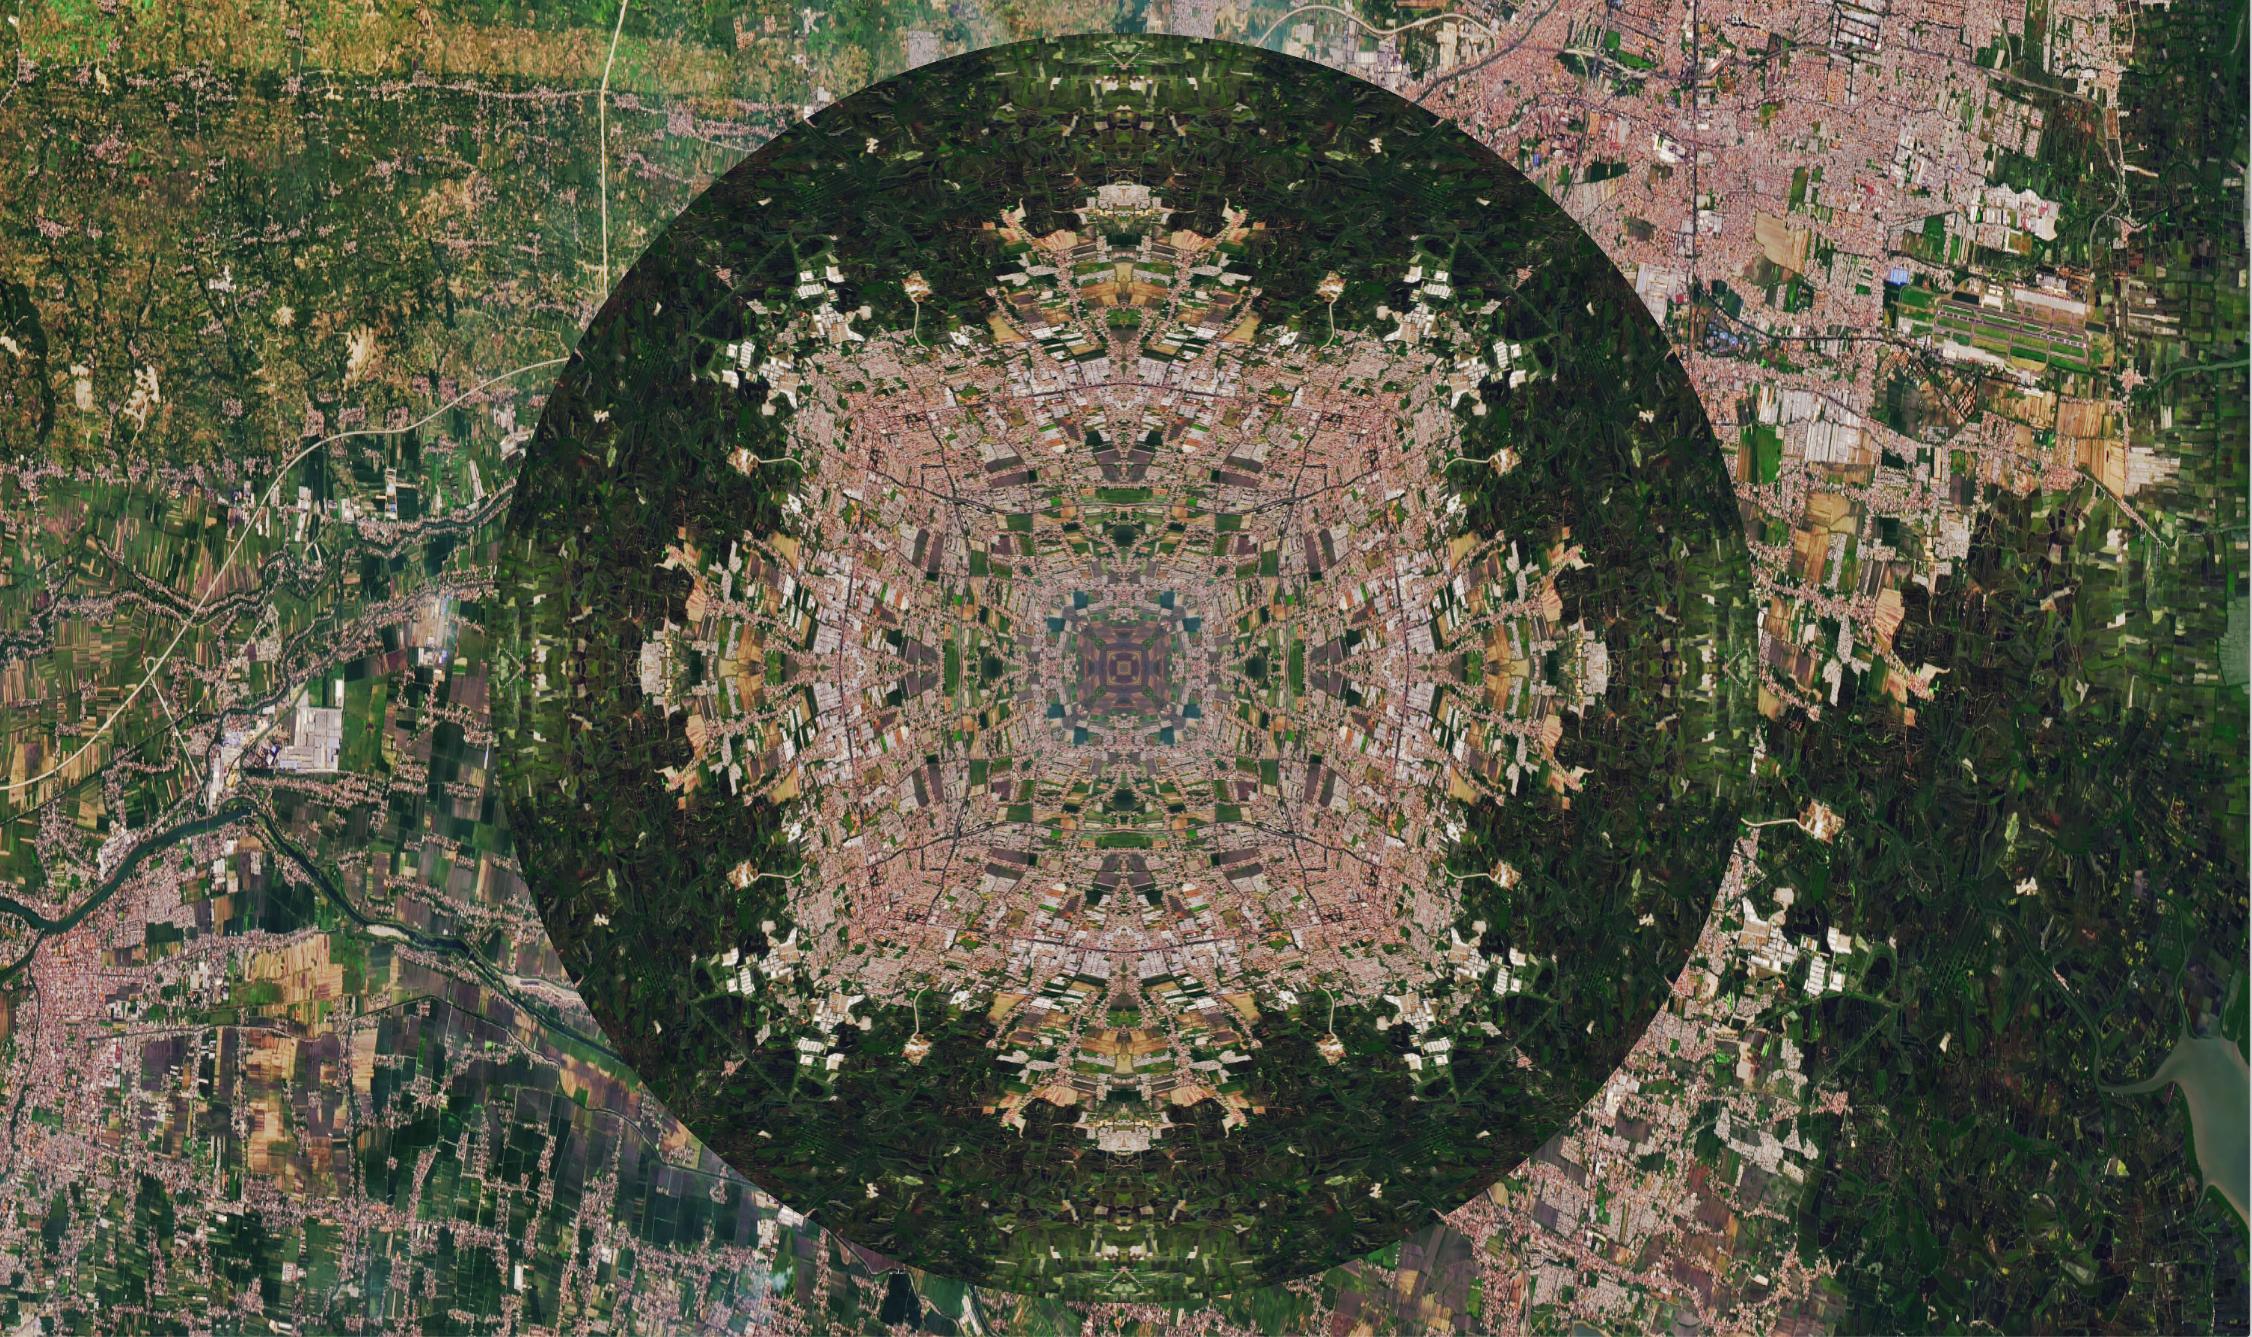 kaleidoscope-3.jpg